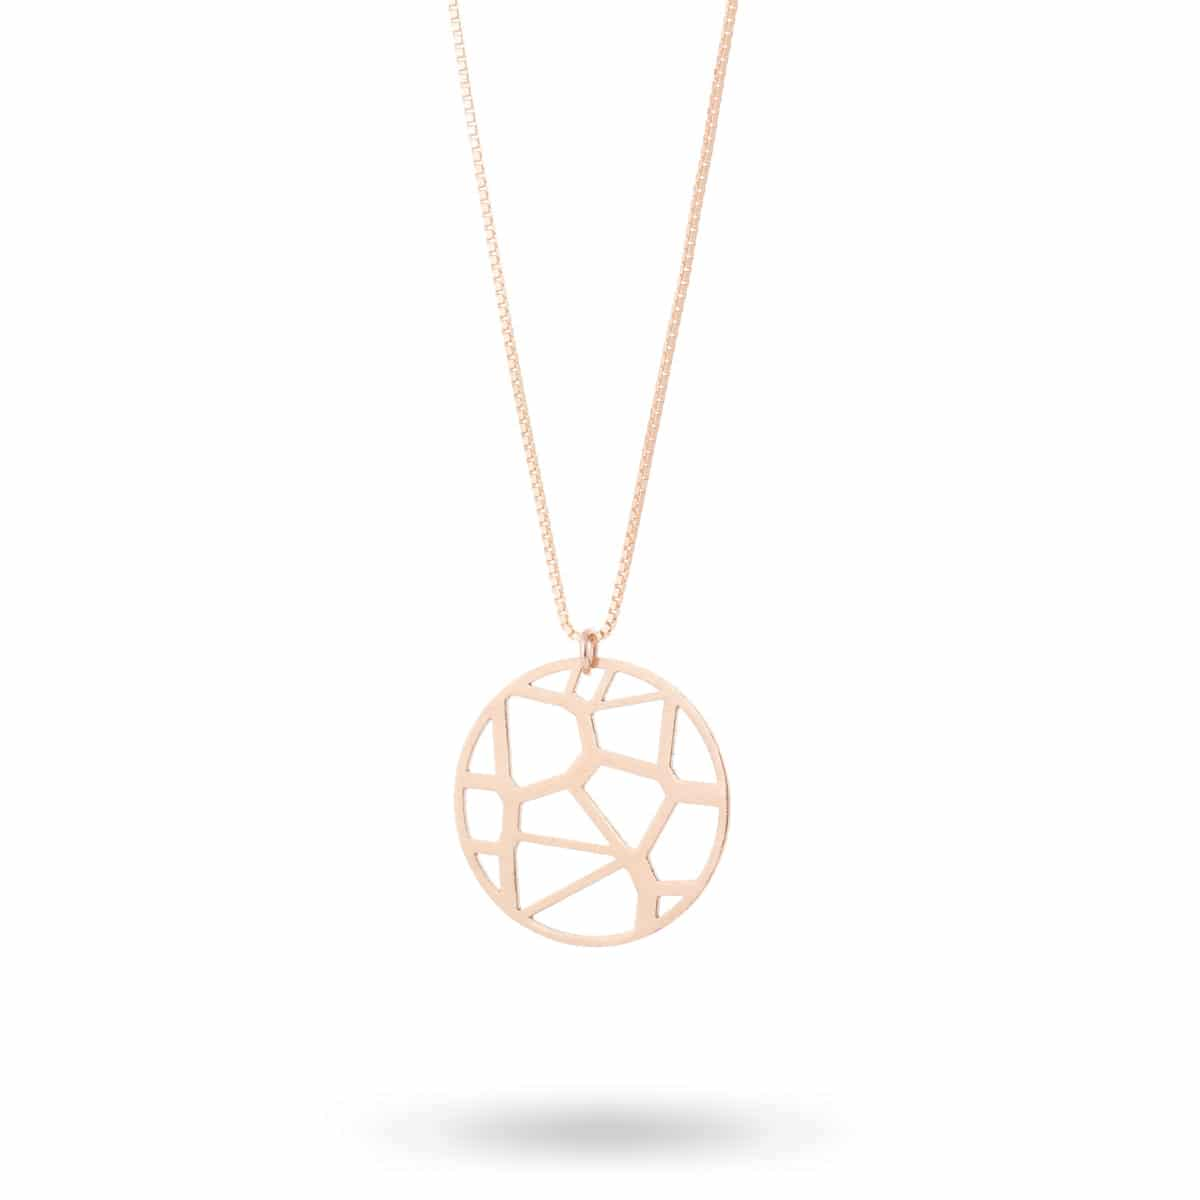 1-Vornoi-pendant-raw-bronze-1200px